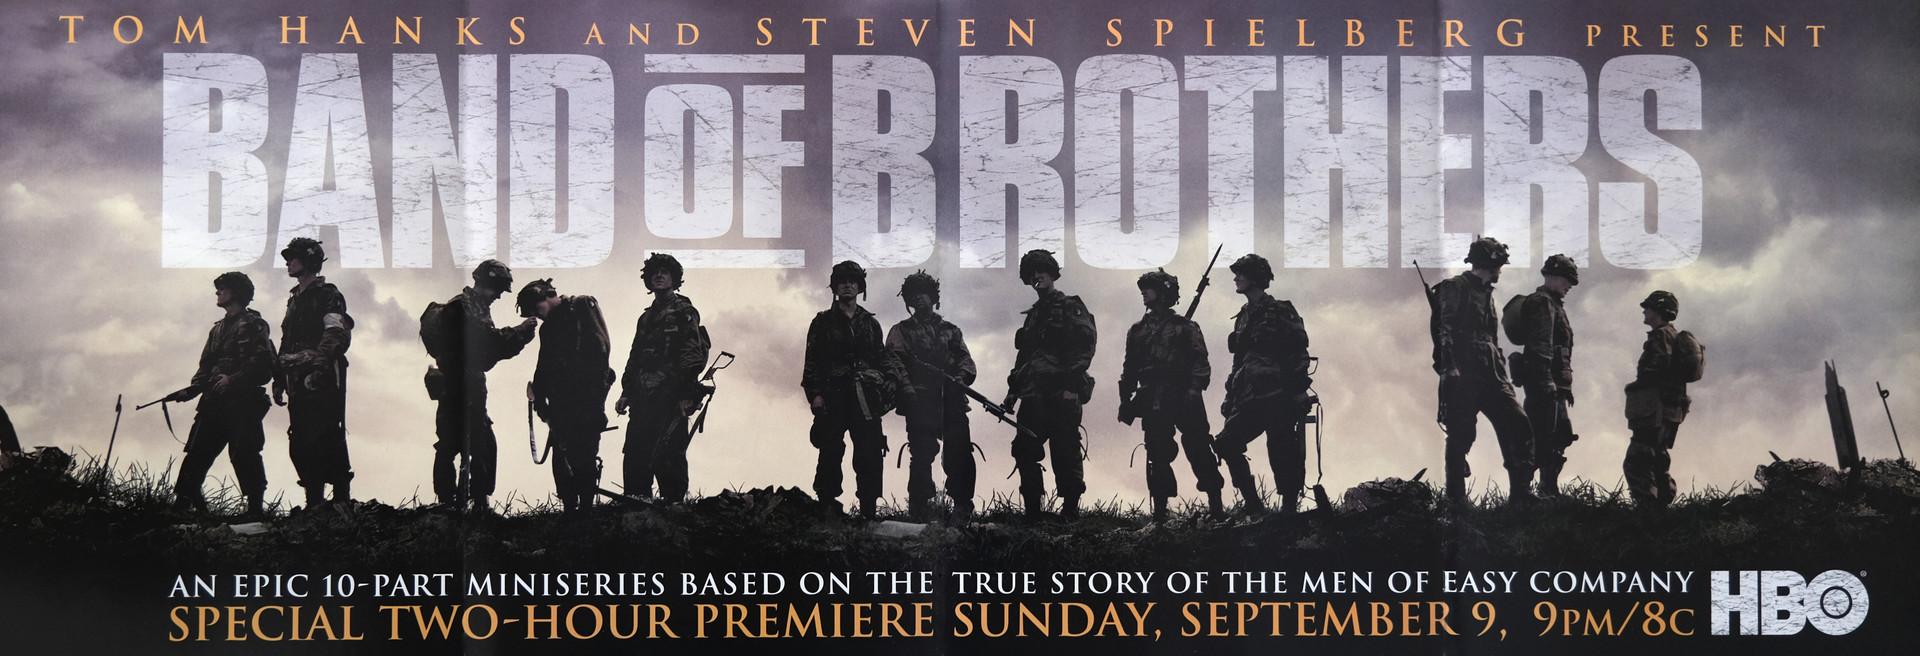 BOB Skyline Poster copy.jpg